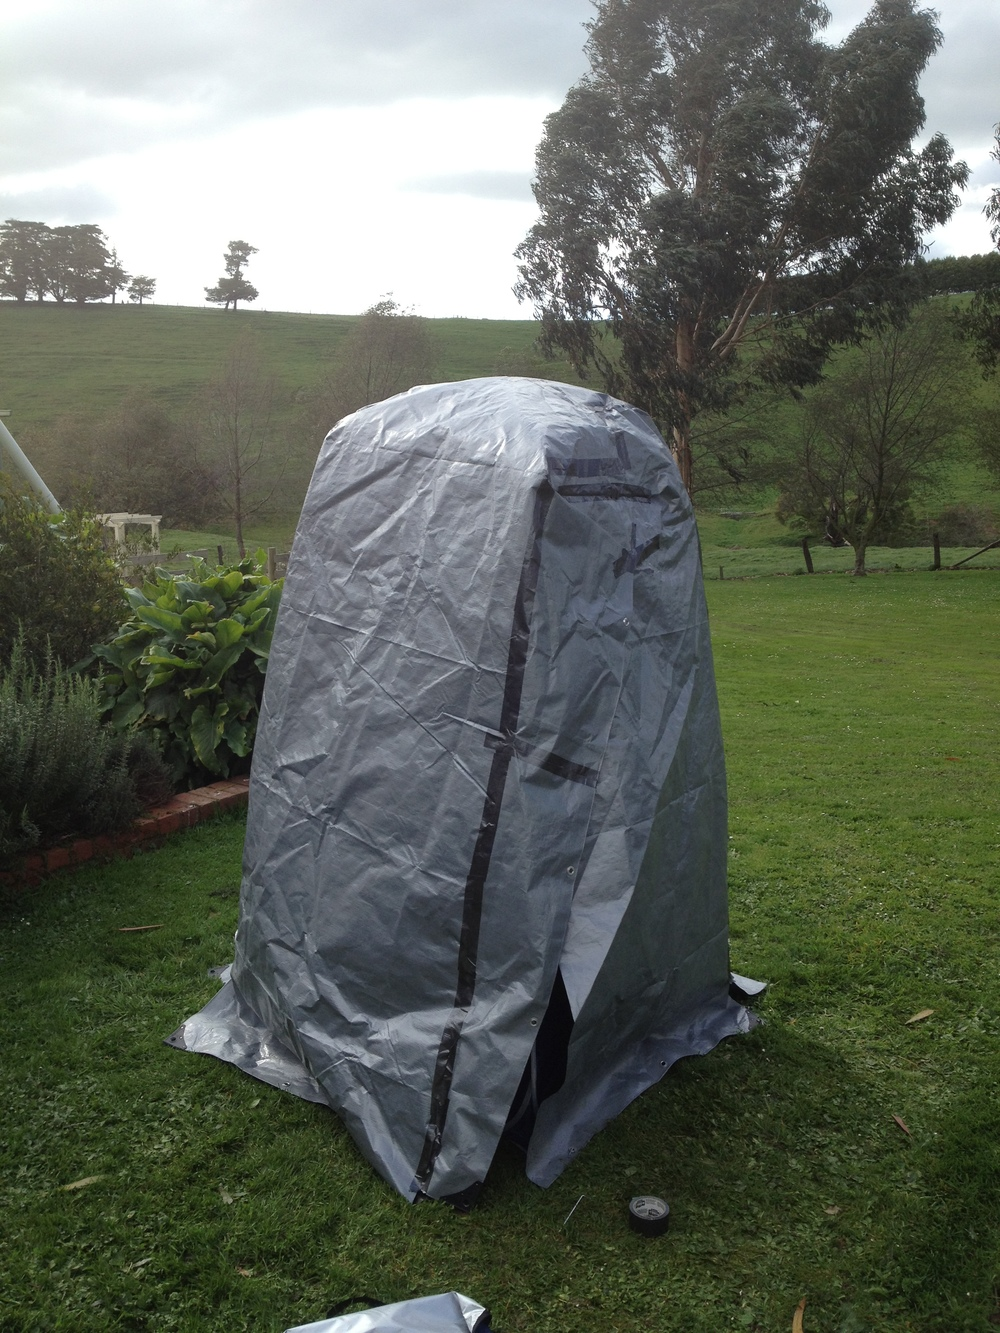 Taped up tarp cover to make the portable darkroom dark.